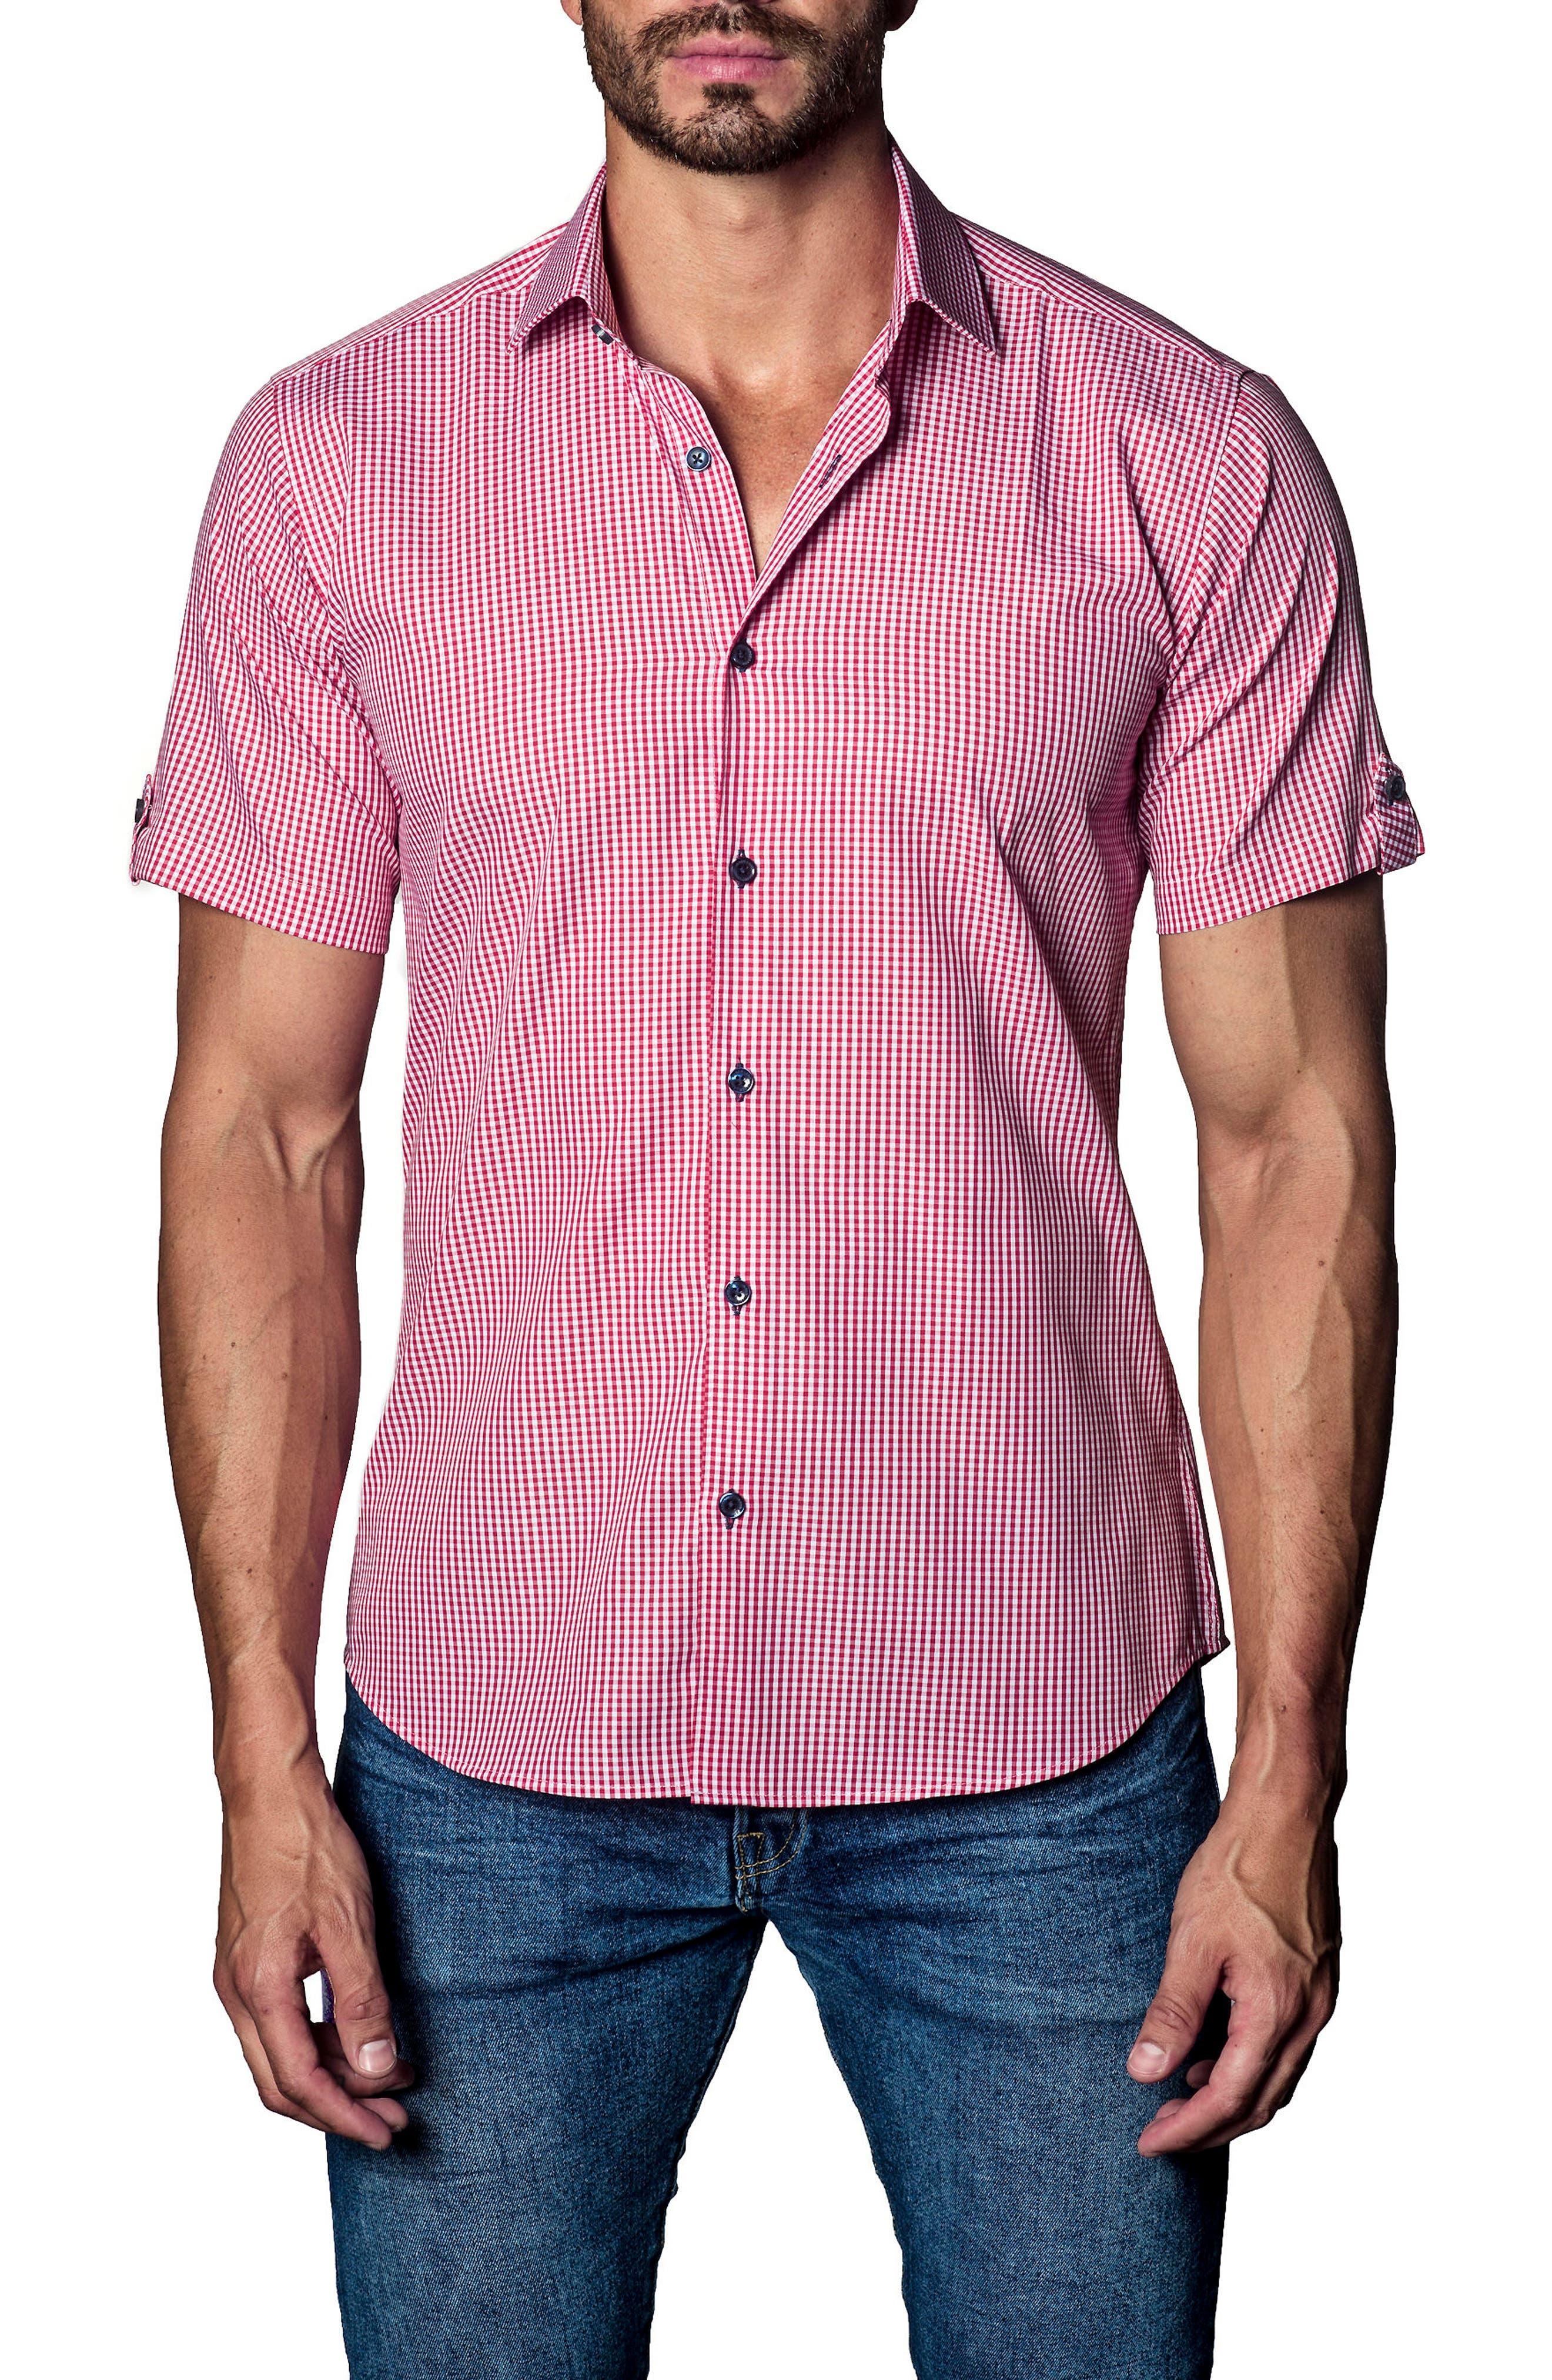 Alternate Image 1 Selected - Jared Lang Check Sport Shirt